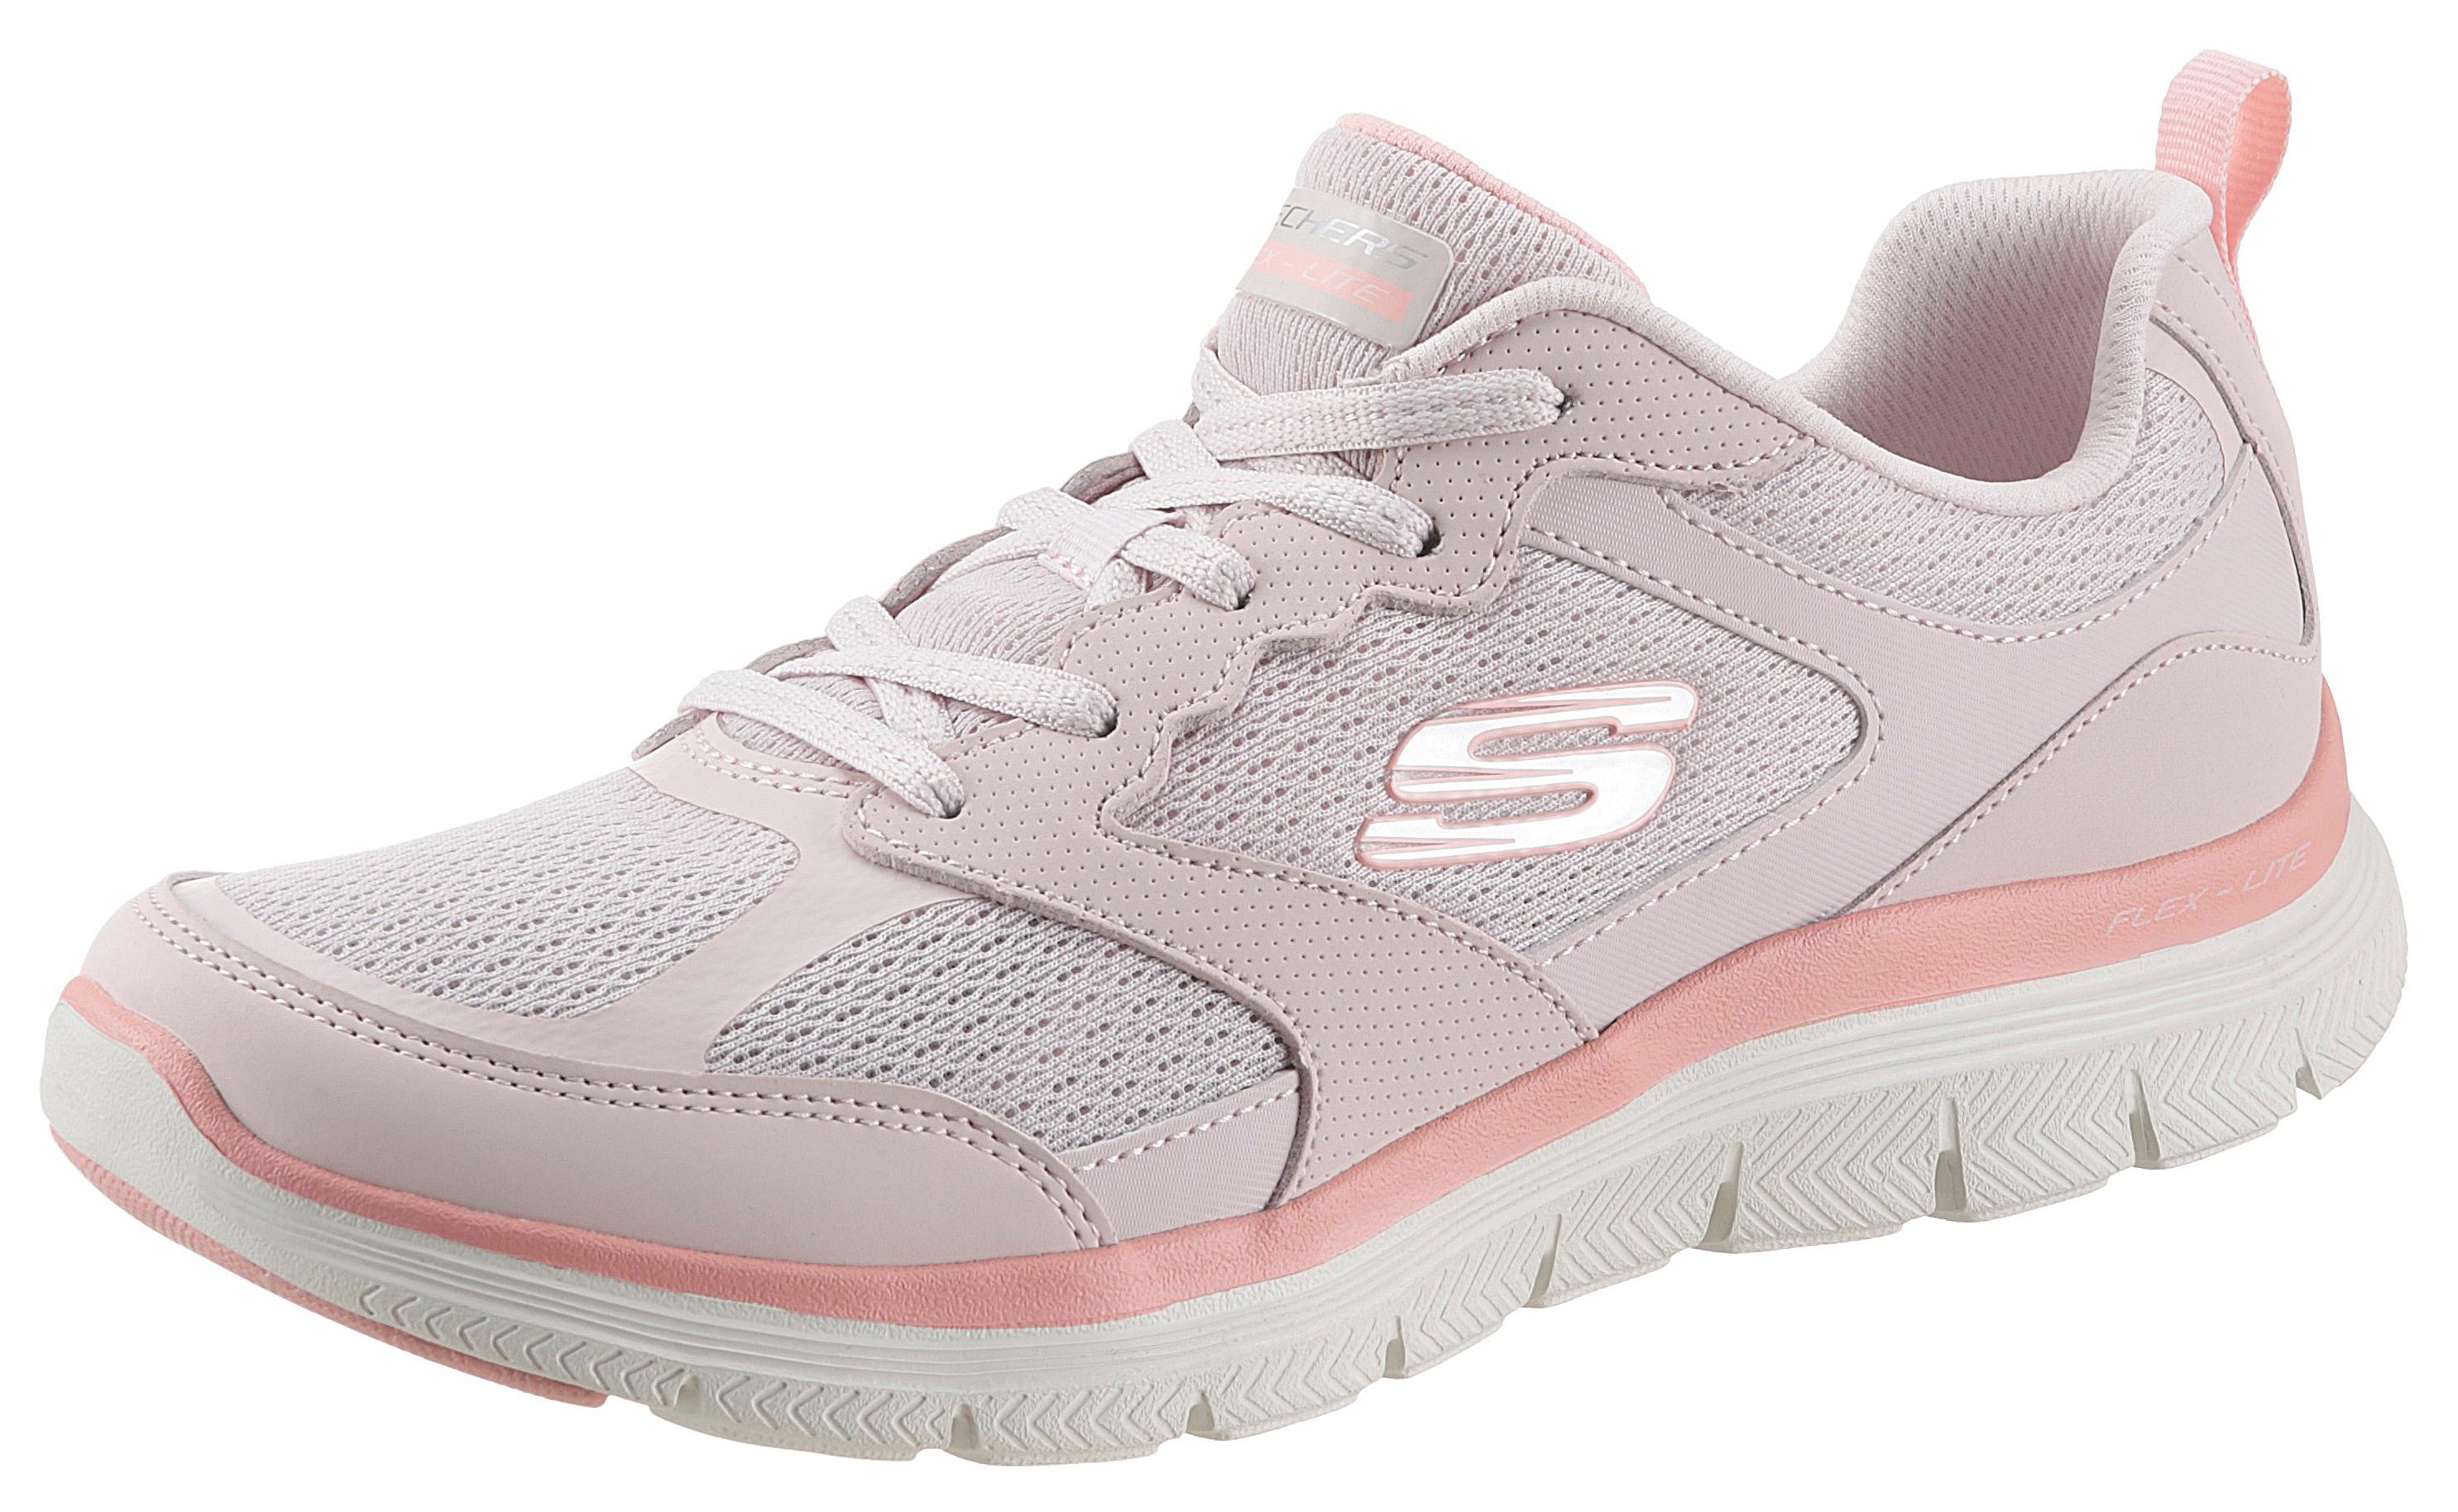 skechers -  Sneaker FLEX APPEAL 4.0 - ACTIVE FLOW, mit komfortabler Innensohle